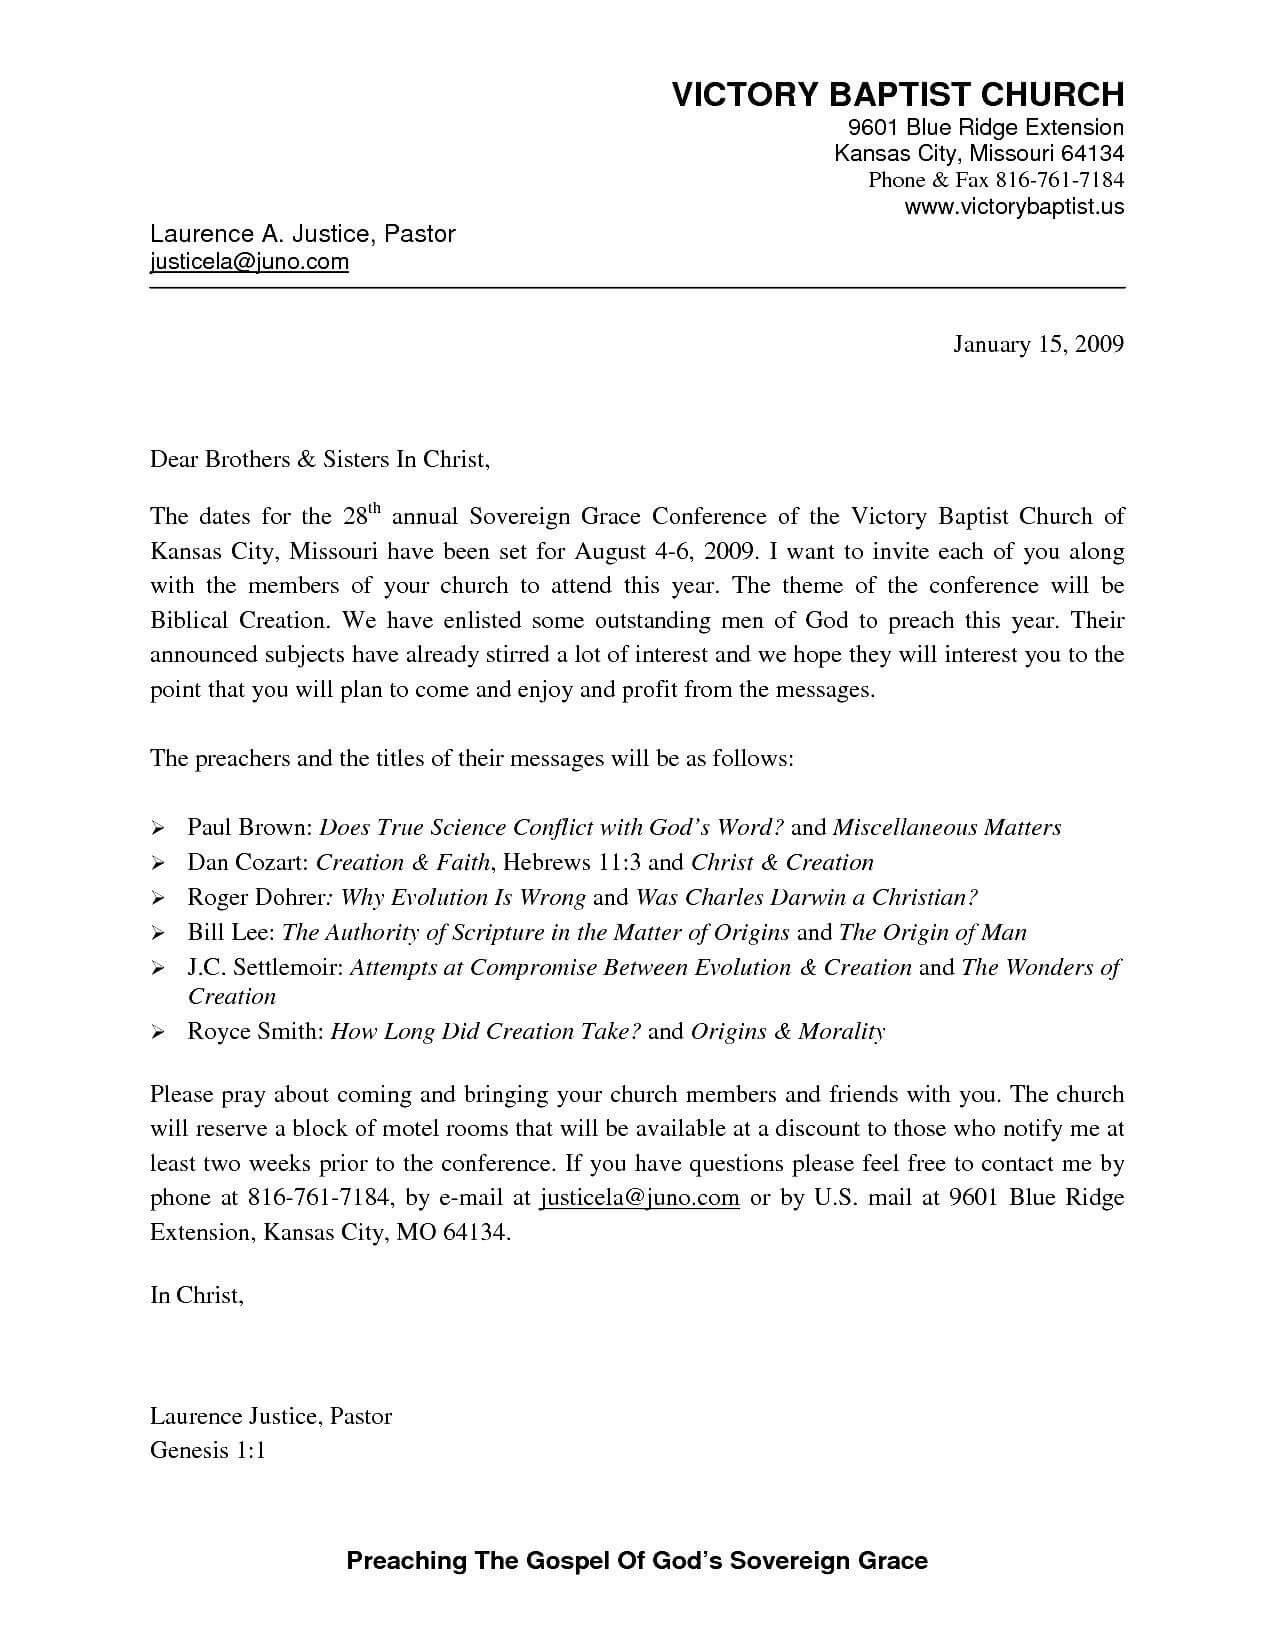 Formal Invitation Letter Seminar | Invitation Templates (Free) Intended For Seminar Invitation Card Template